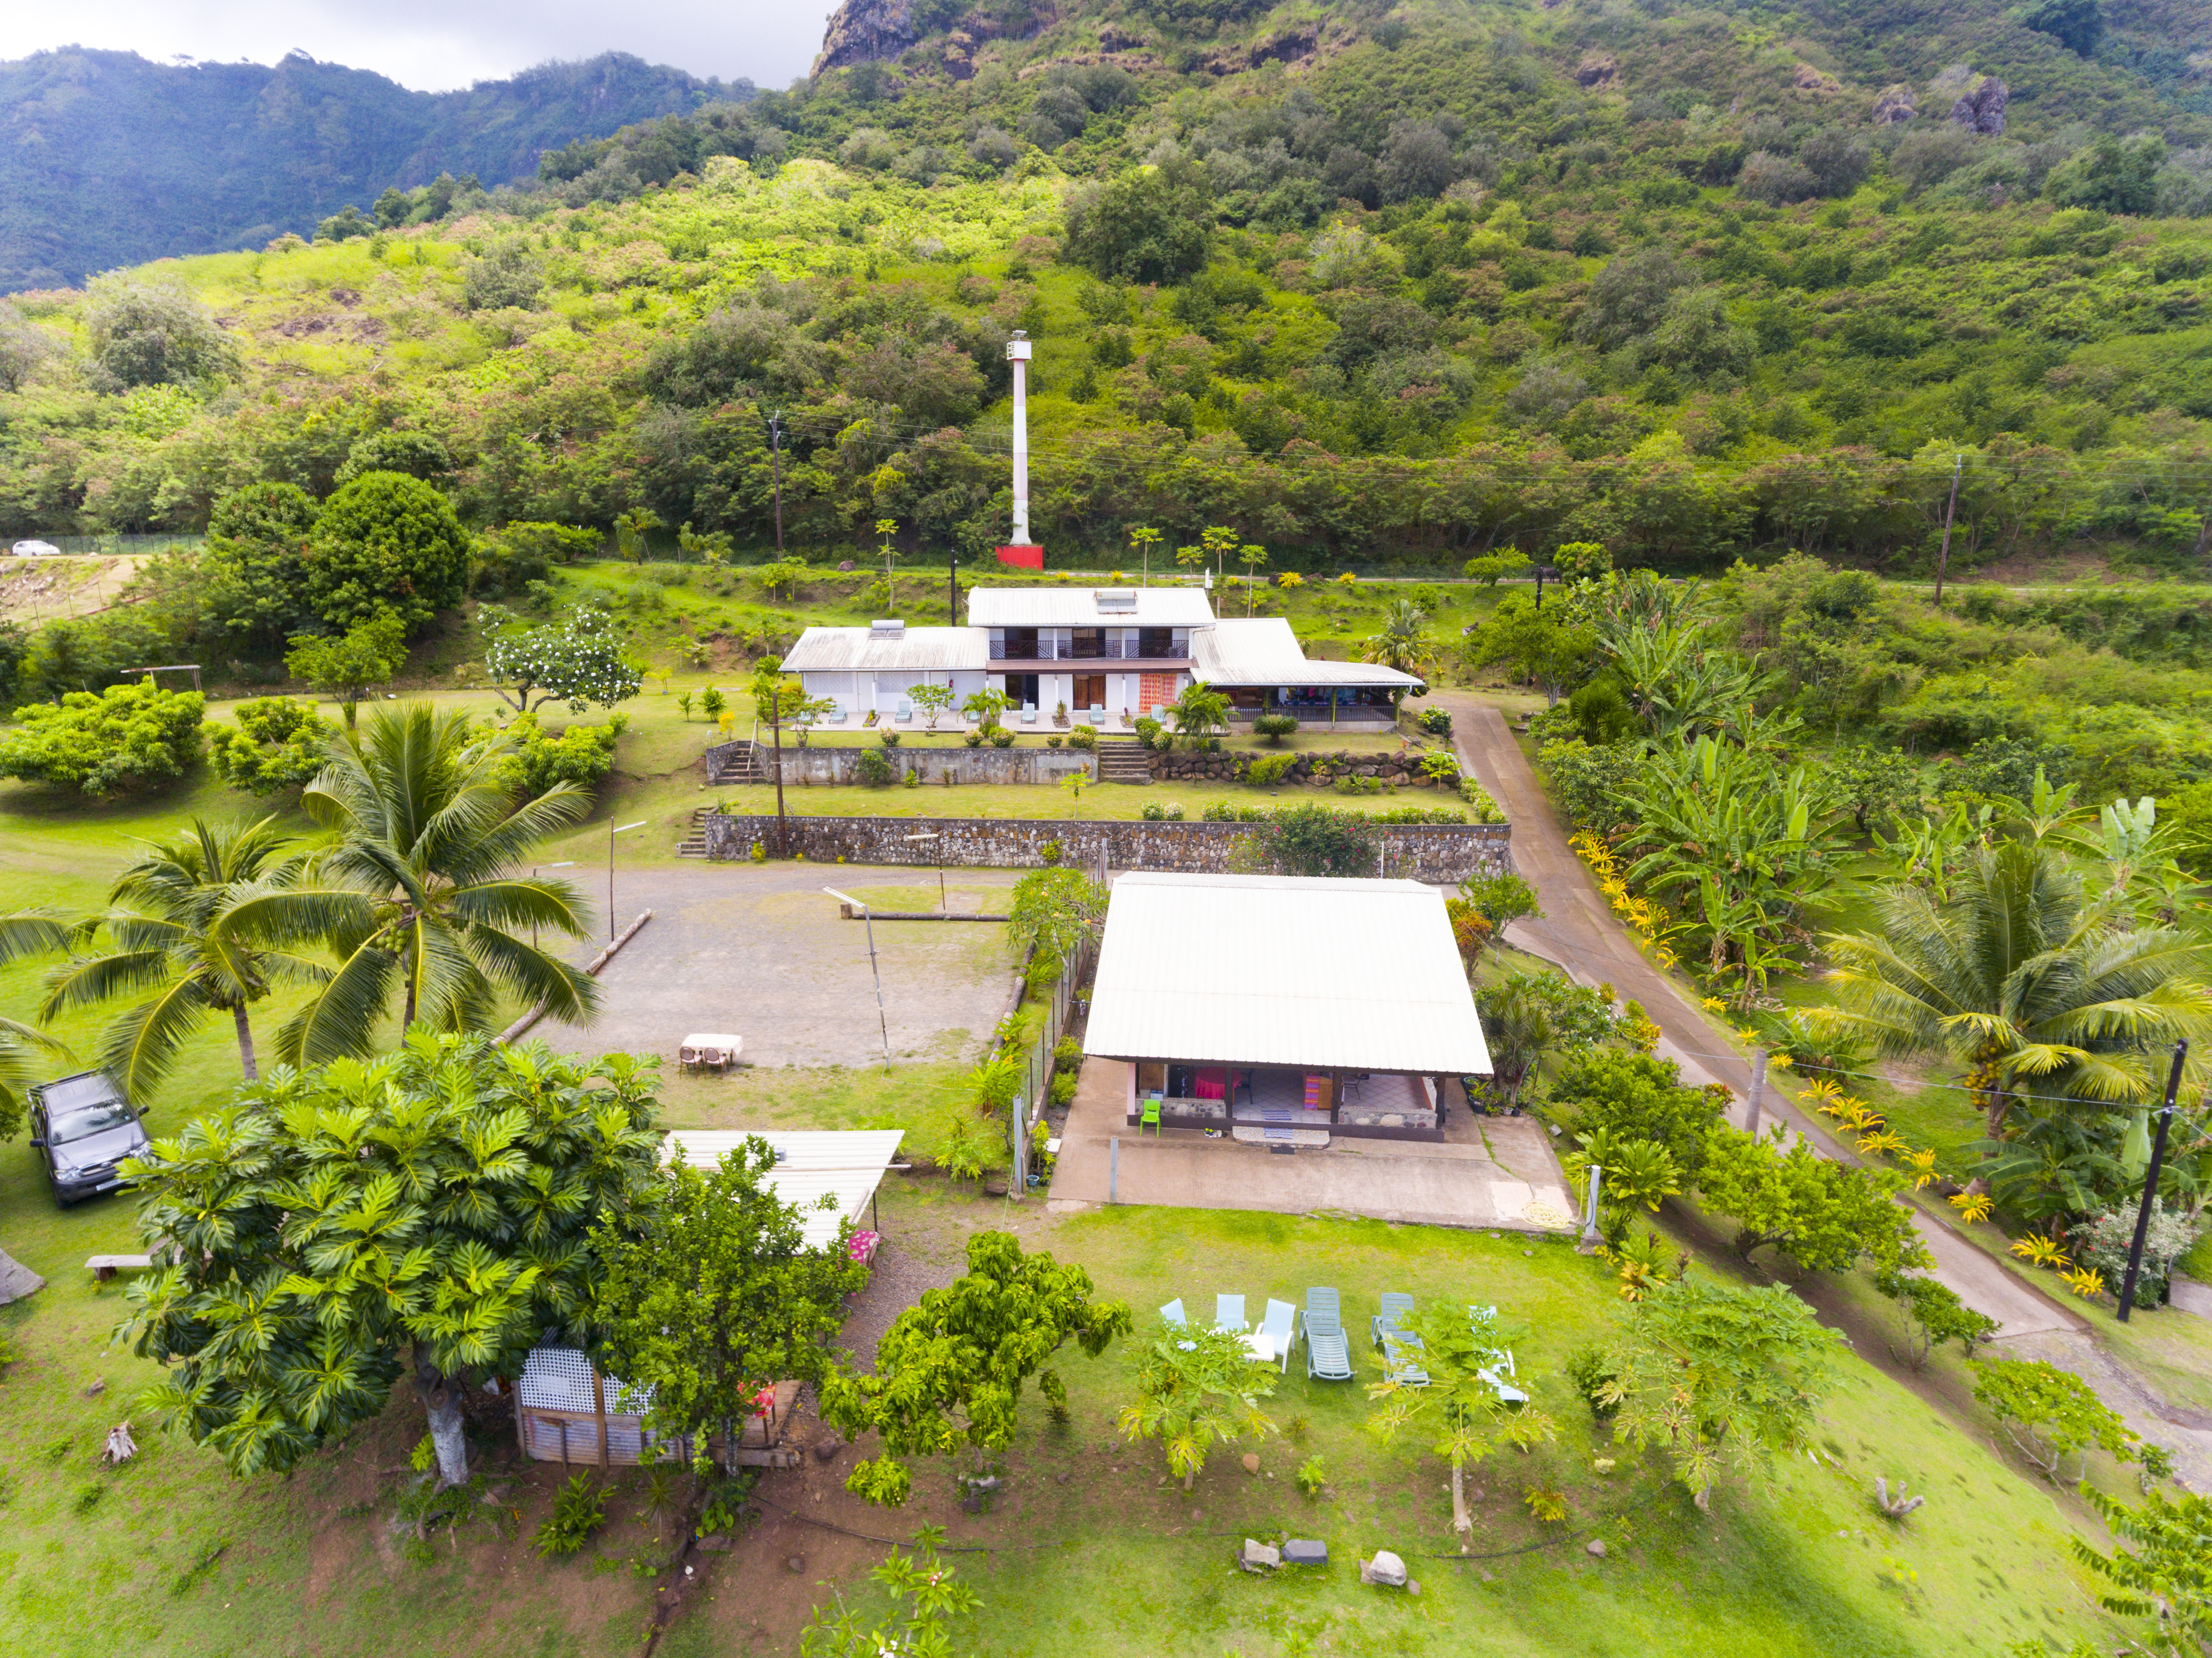 https://tahititourisme.de/wp-content/uploads/2018/07/NHV-Nuku-Hiva-Mave-Mai_Aerial-view-1.jpg